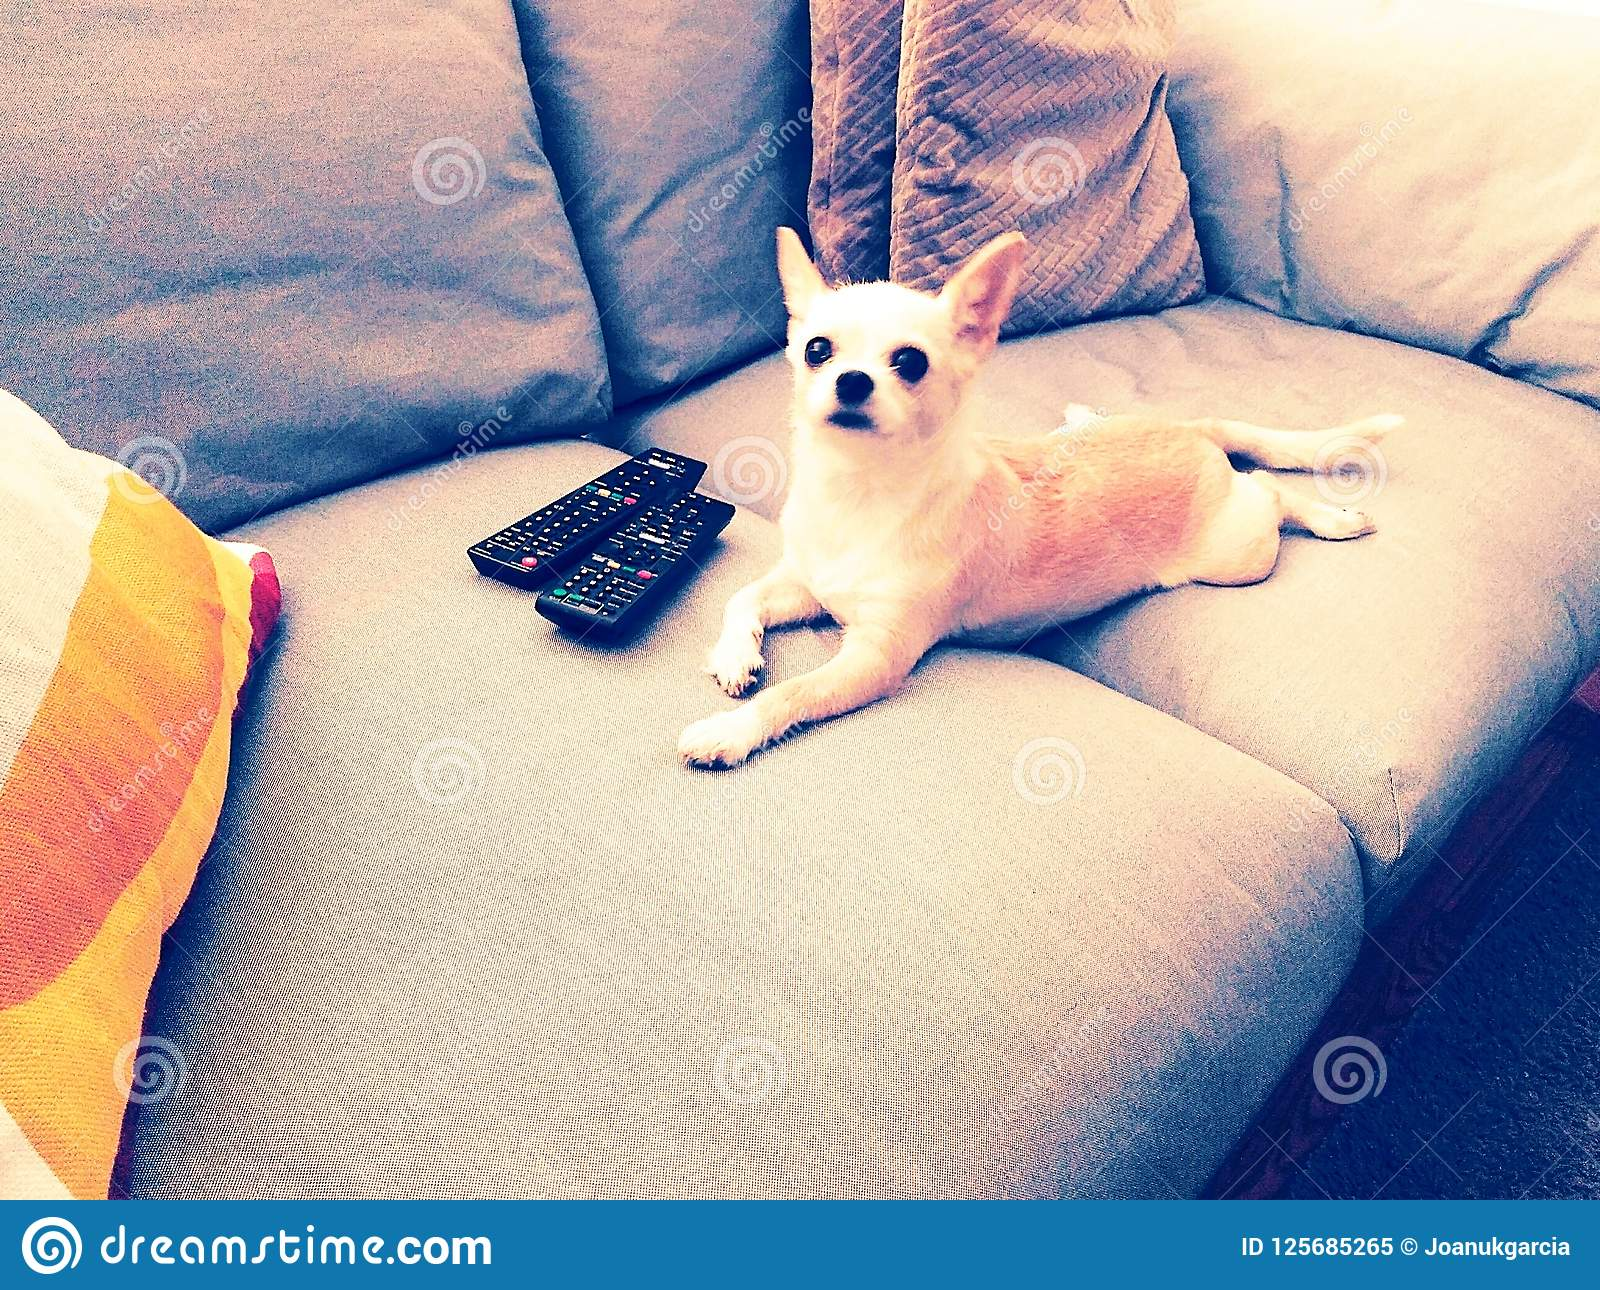 TV σκυλιών, σκυλί που βρίσκεται στον καναπέ με τους ελέγχους TV